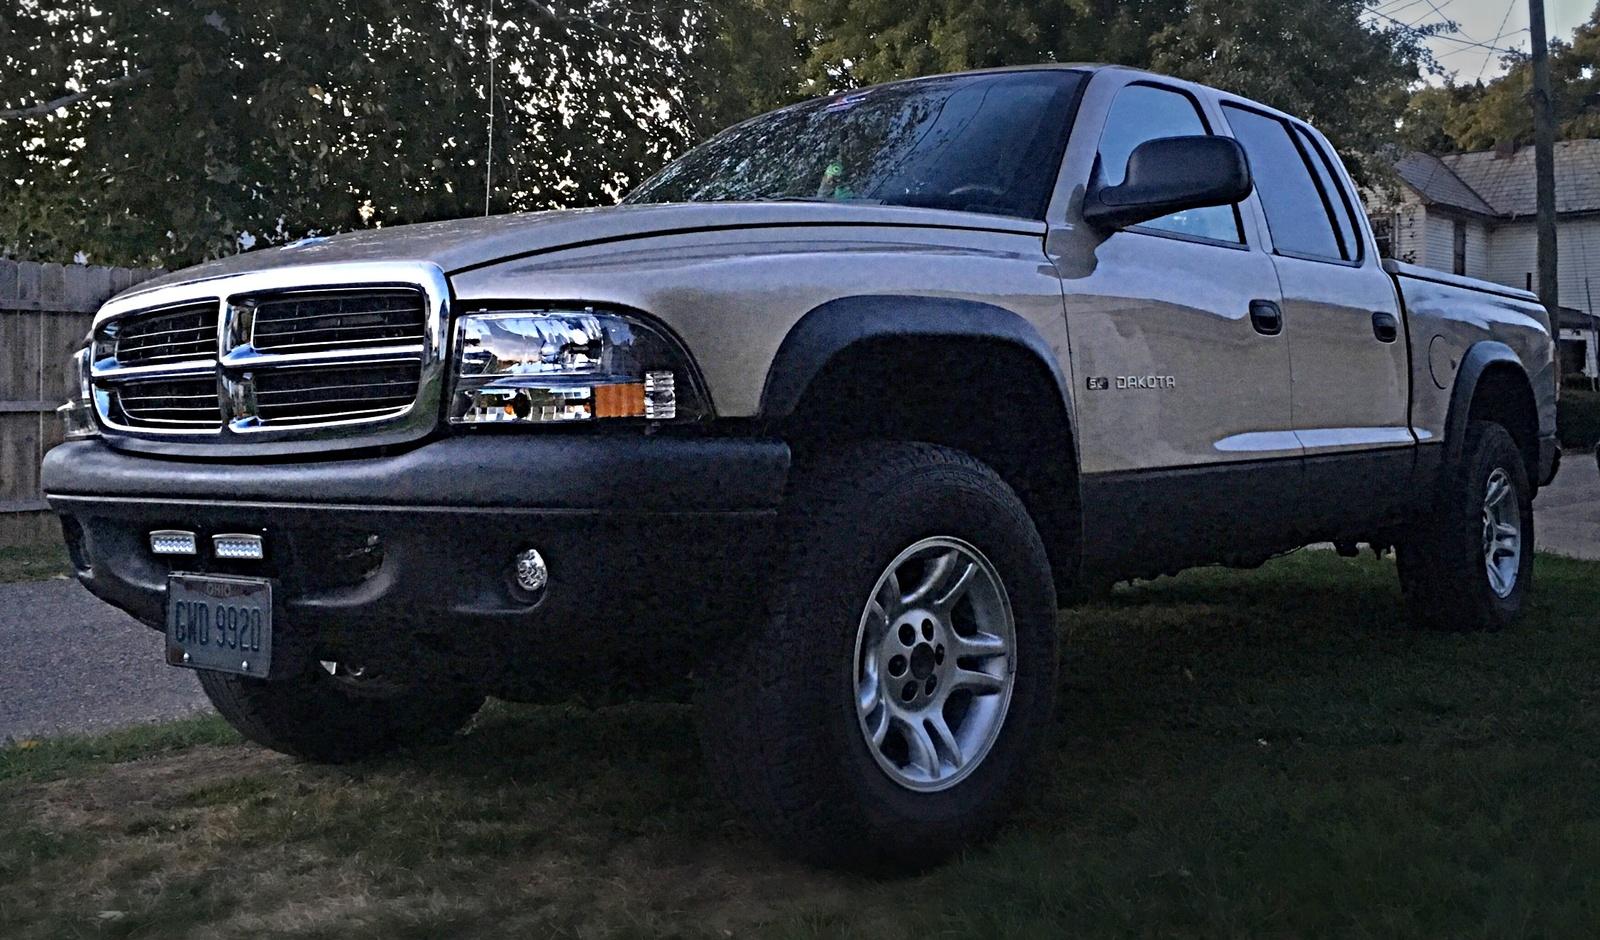 2002 Dodge Dakota 4.7 v8